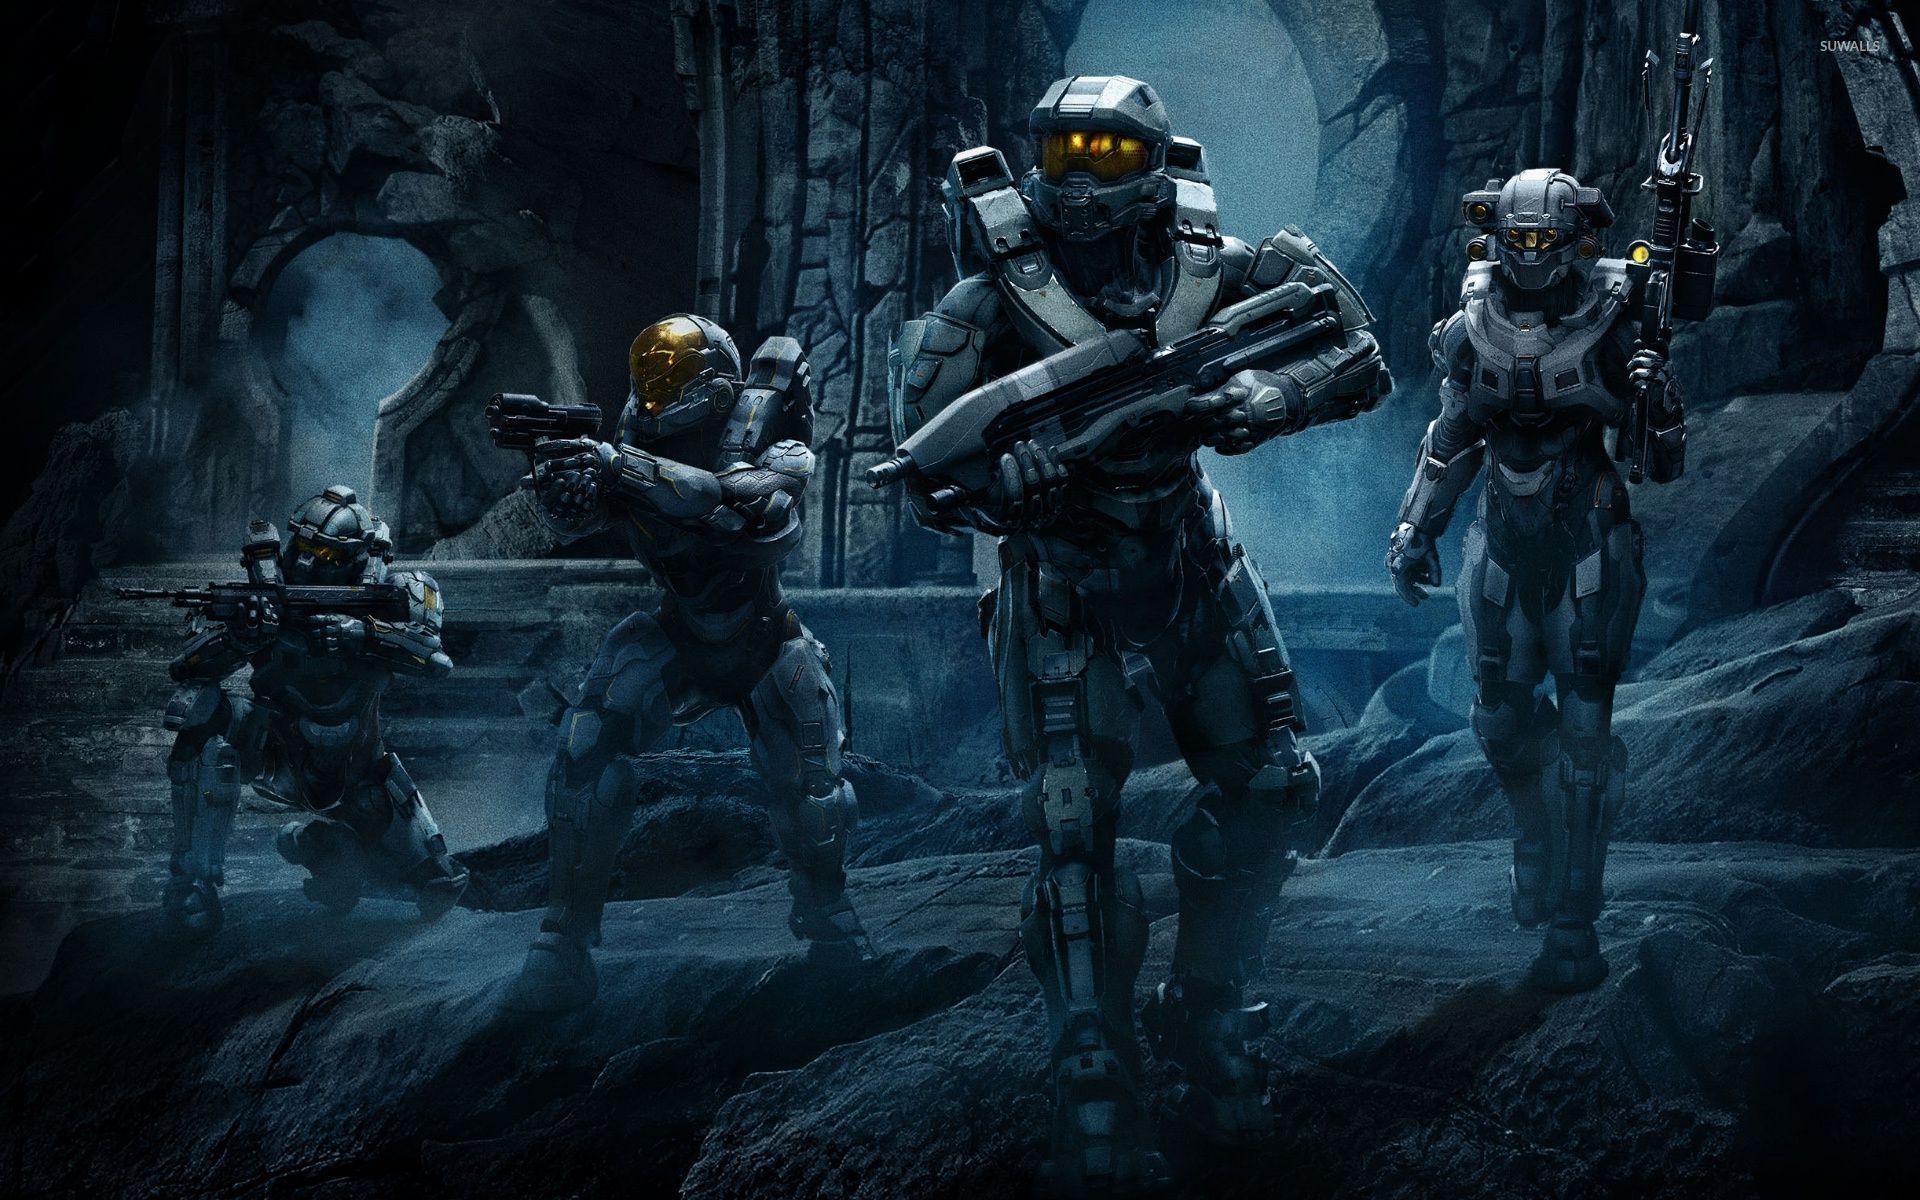 Halo 5: Guardians [5] wallpaper